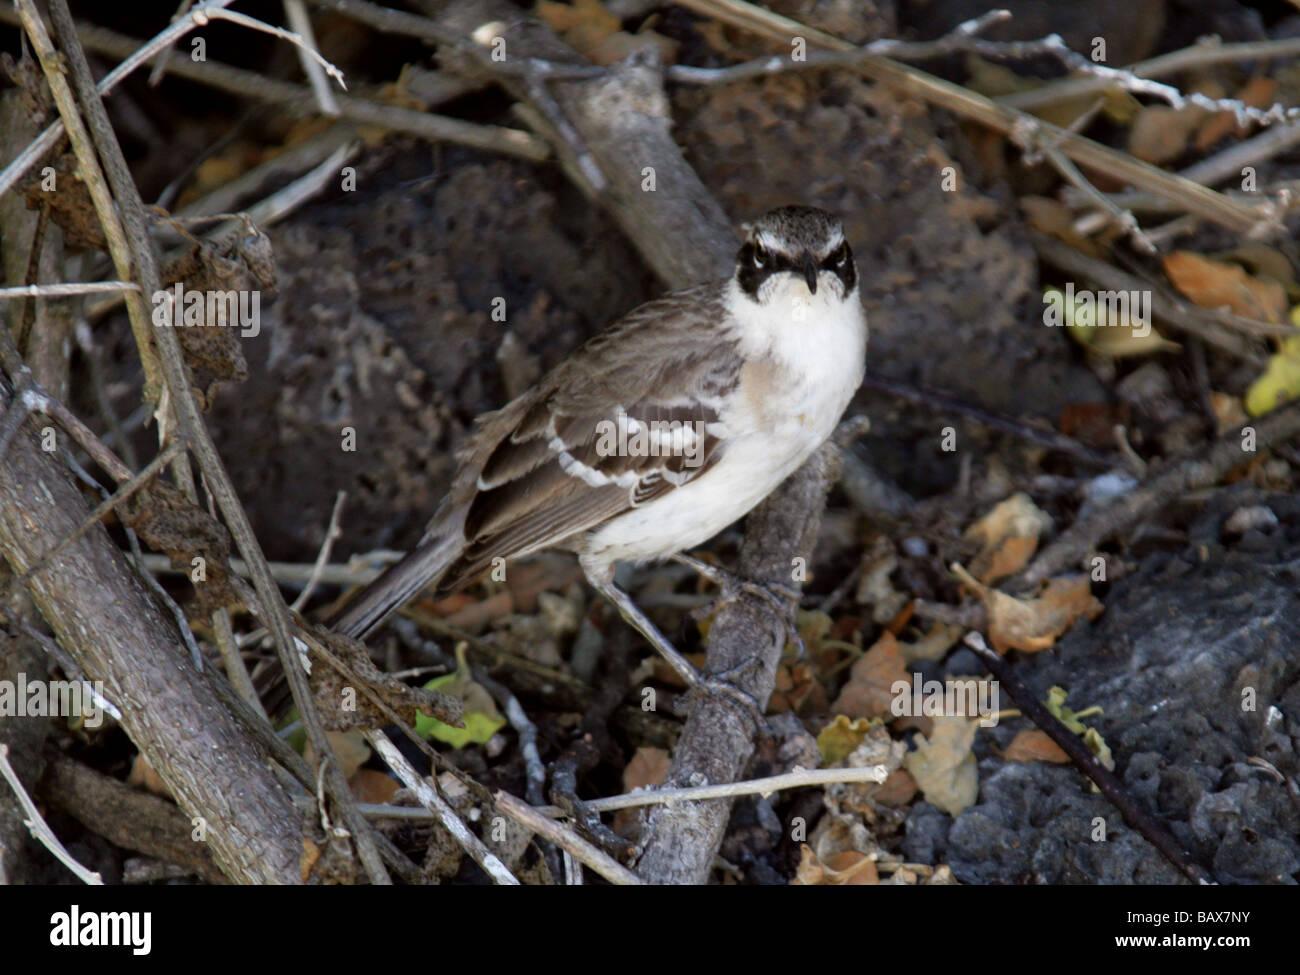 Galapagos Mockingbird, Nesomimus parvulus syn mimus parvulus, Santa Cruz Island (Indefatigable), Galapagos Islands, Stock Photo